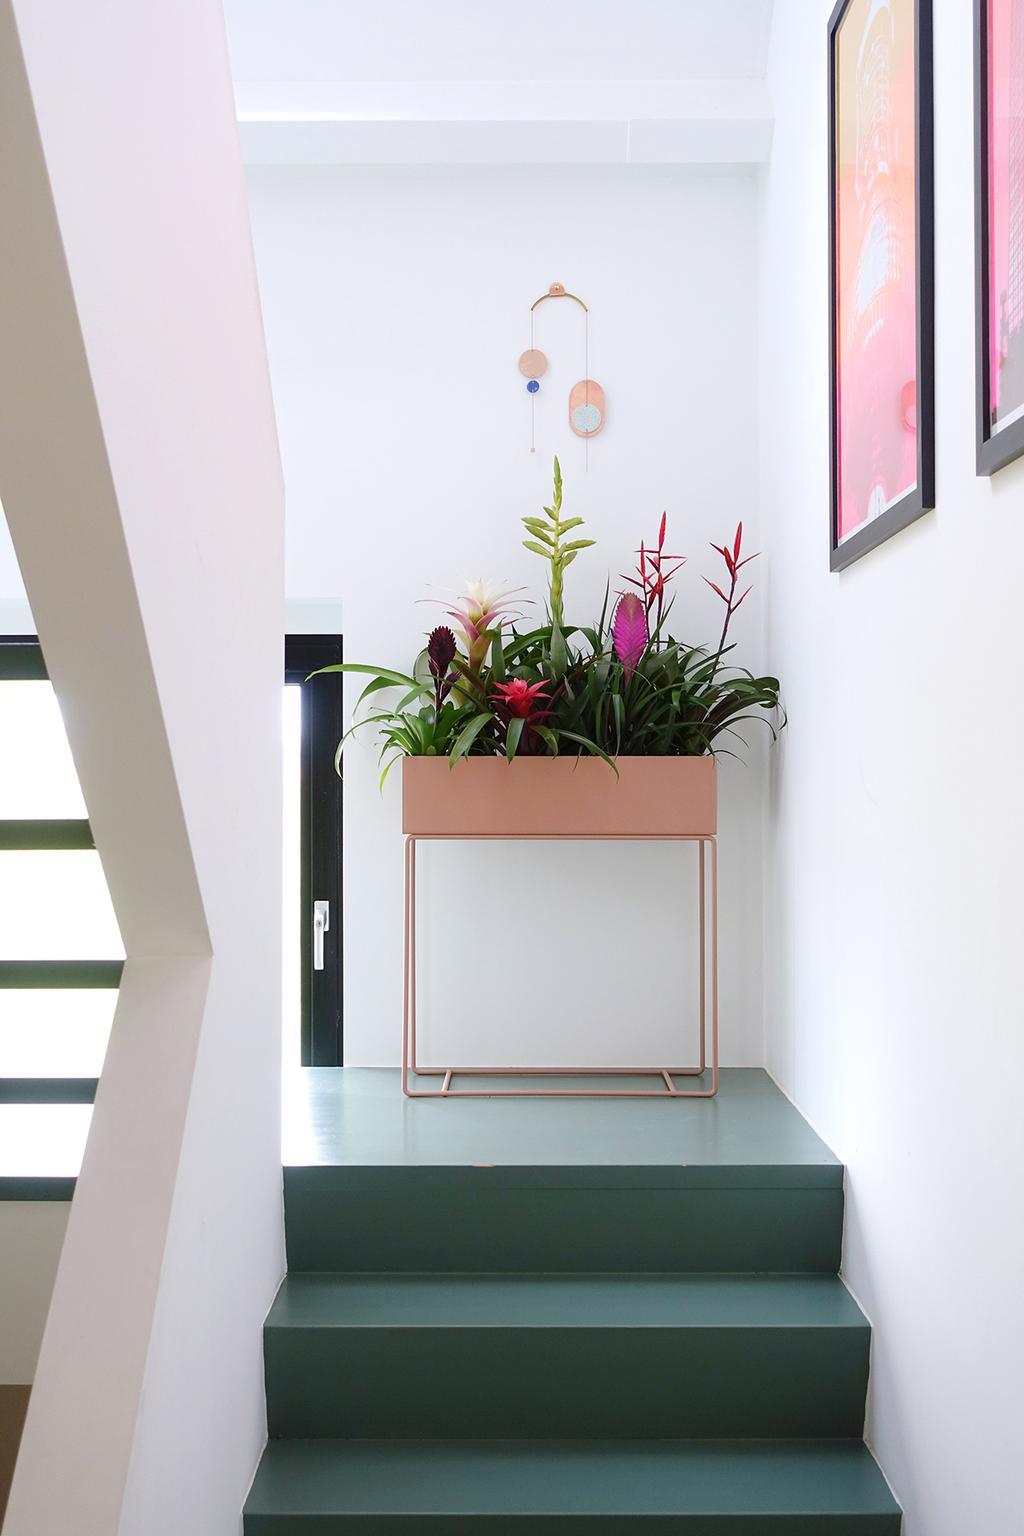 bromelia planten in rose plantenbak in trappenhuis